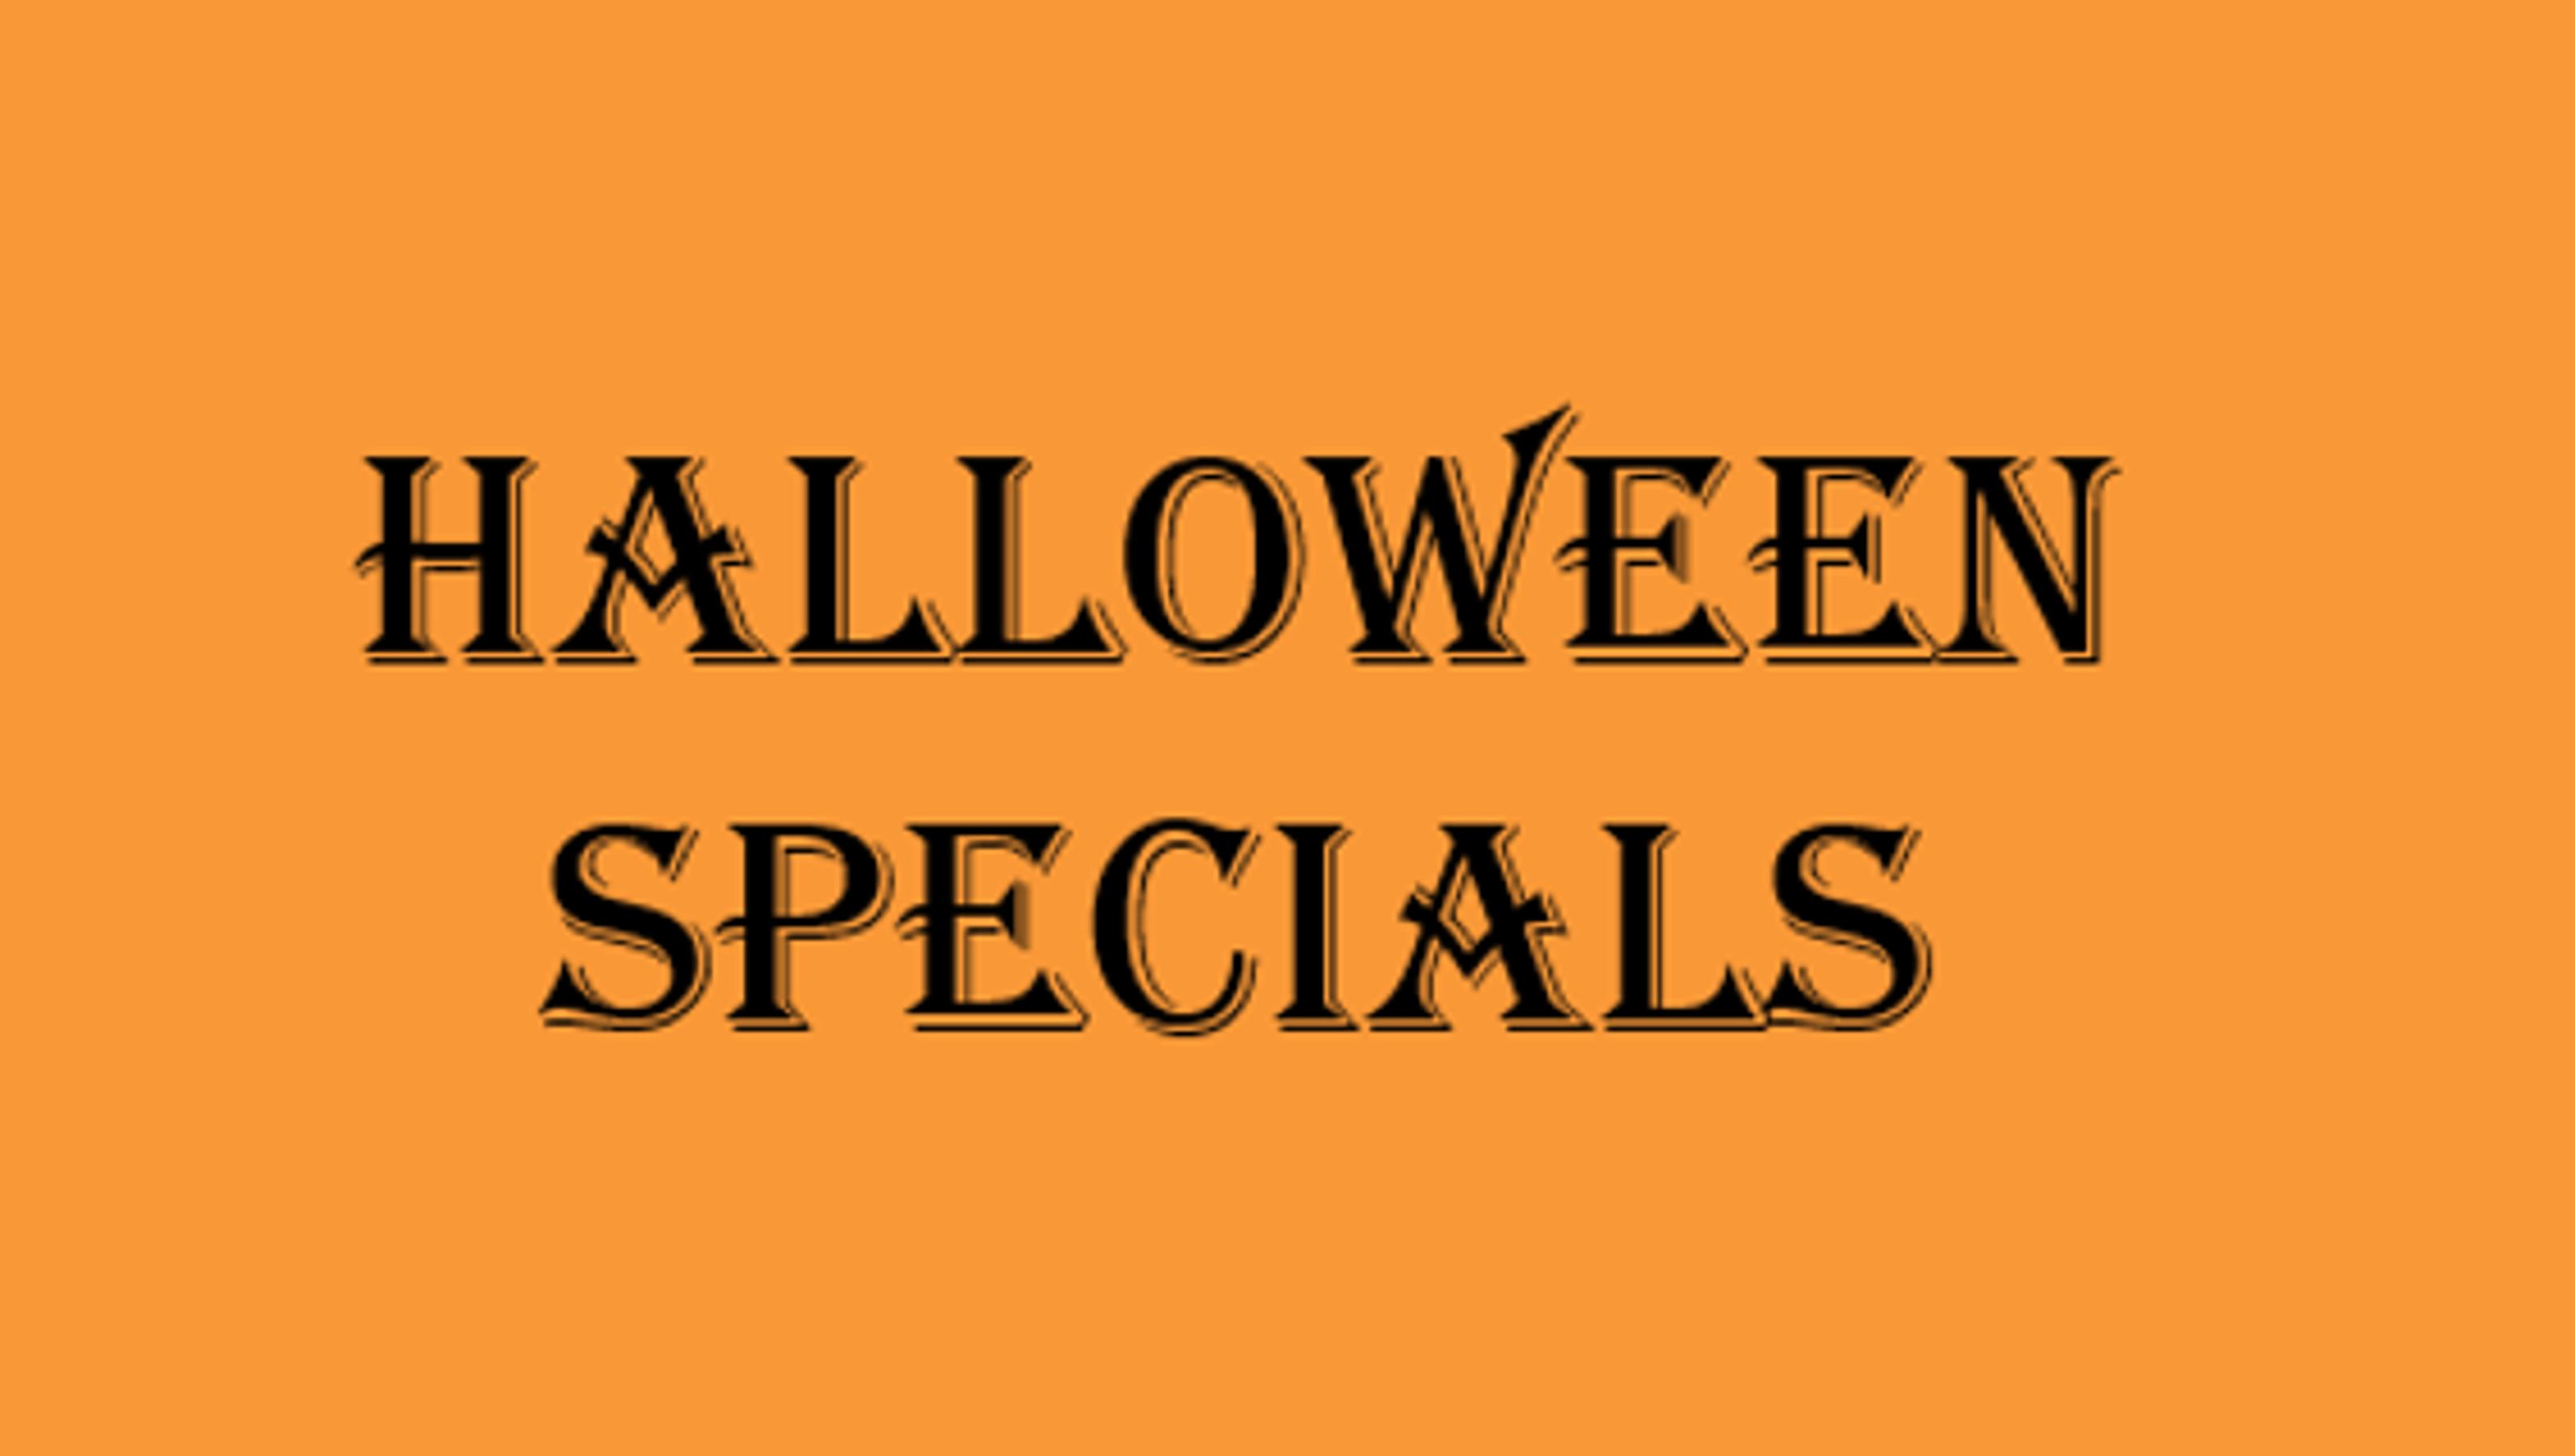 Halloween Television Specials